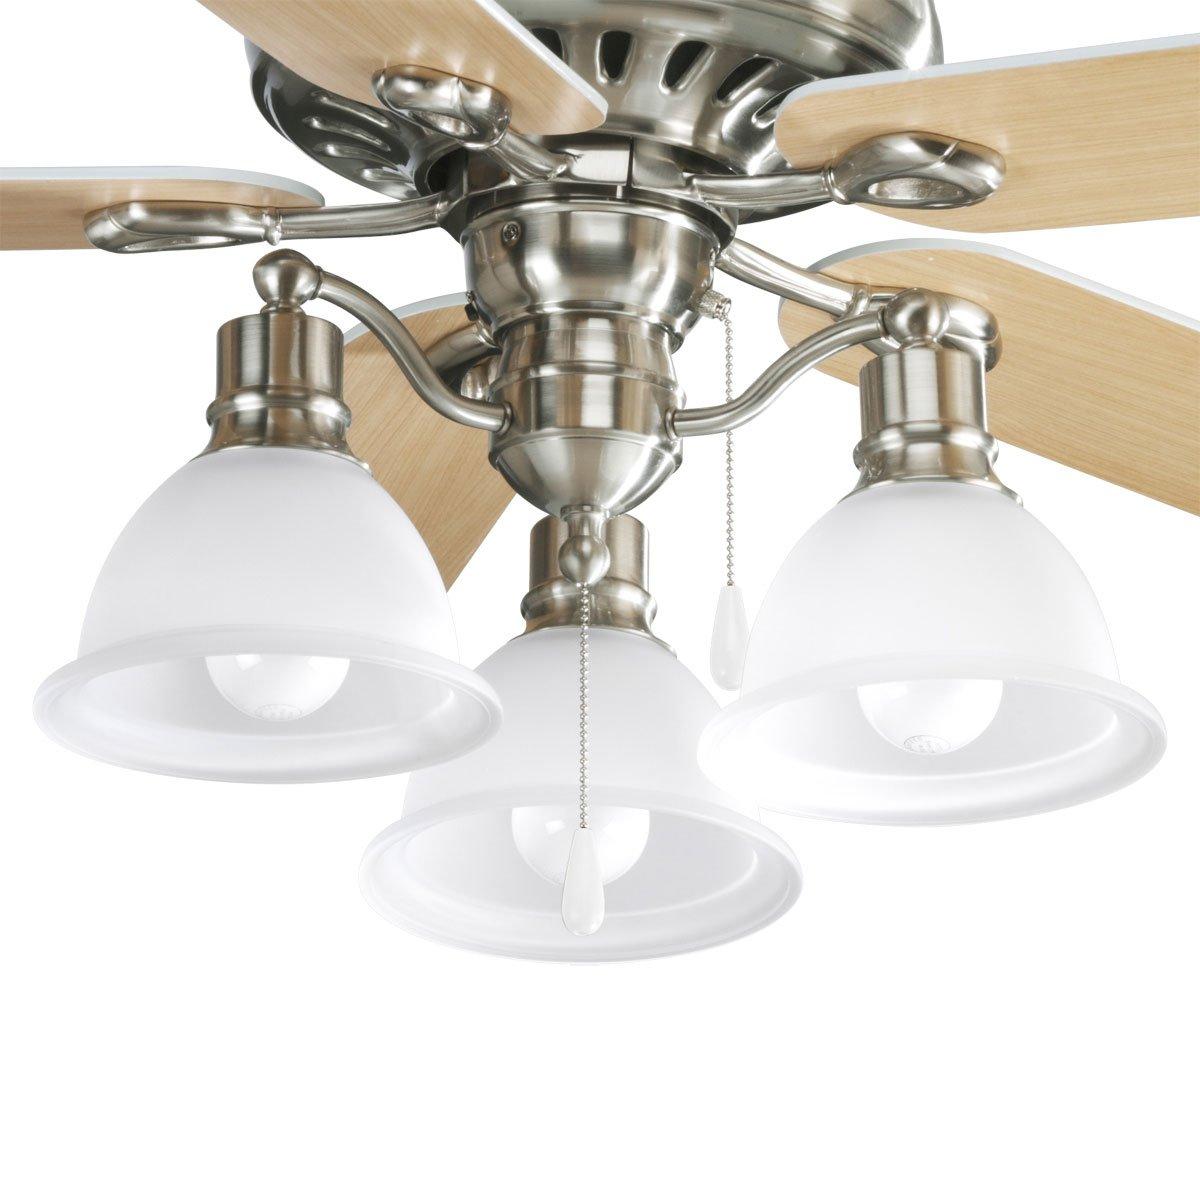 Progress Lighting P2623-09 3-Light Fan Light Kit, Brushed Nickel by Progress Lighting